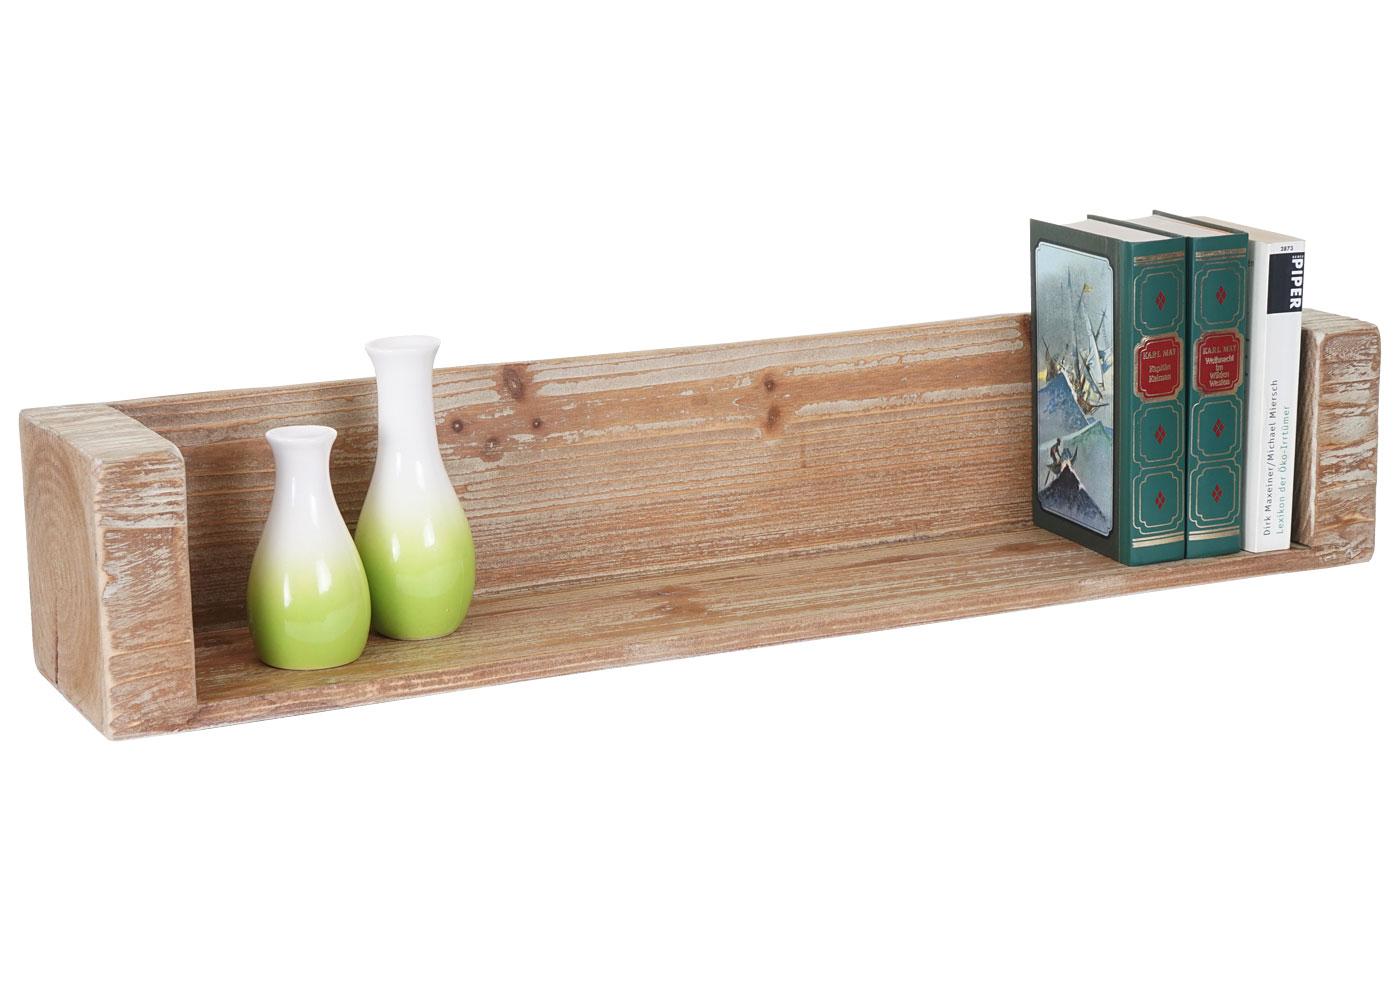 Mendler Wandregal HWC-A15, Hängeregal Bücherregal, Tanne Holz rustikal ~ Variantenangebot 56883